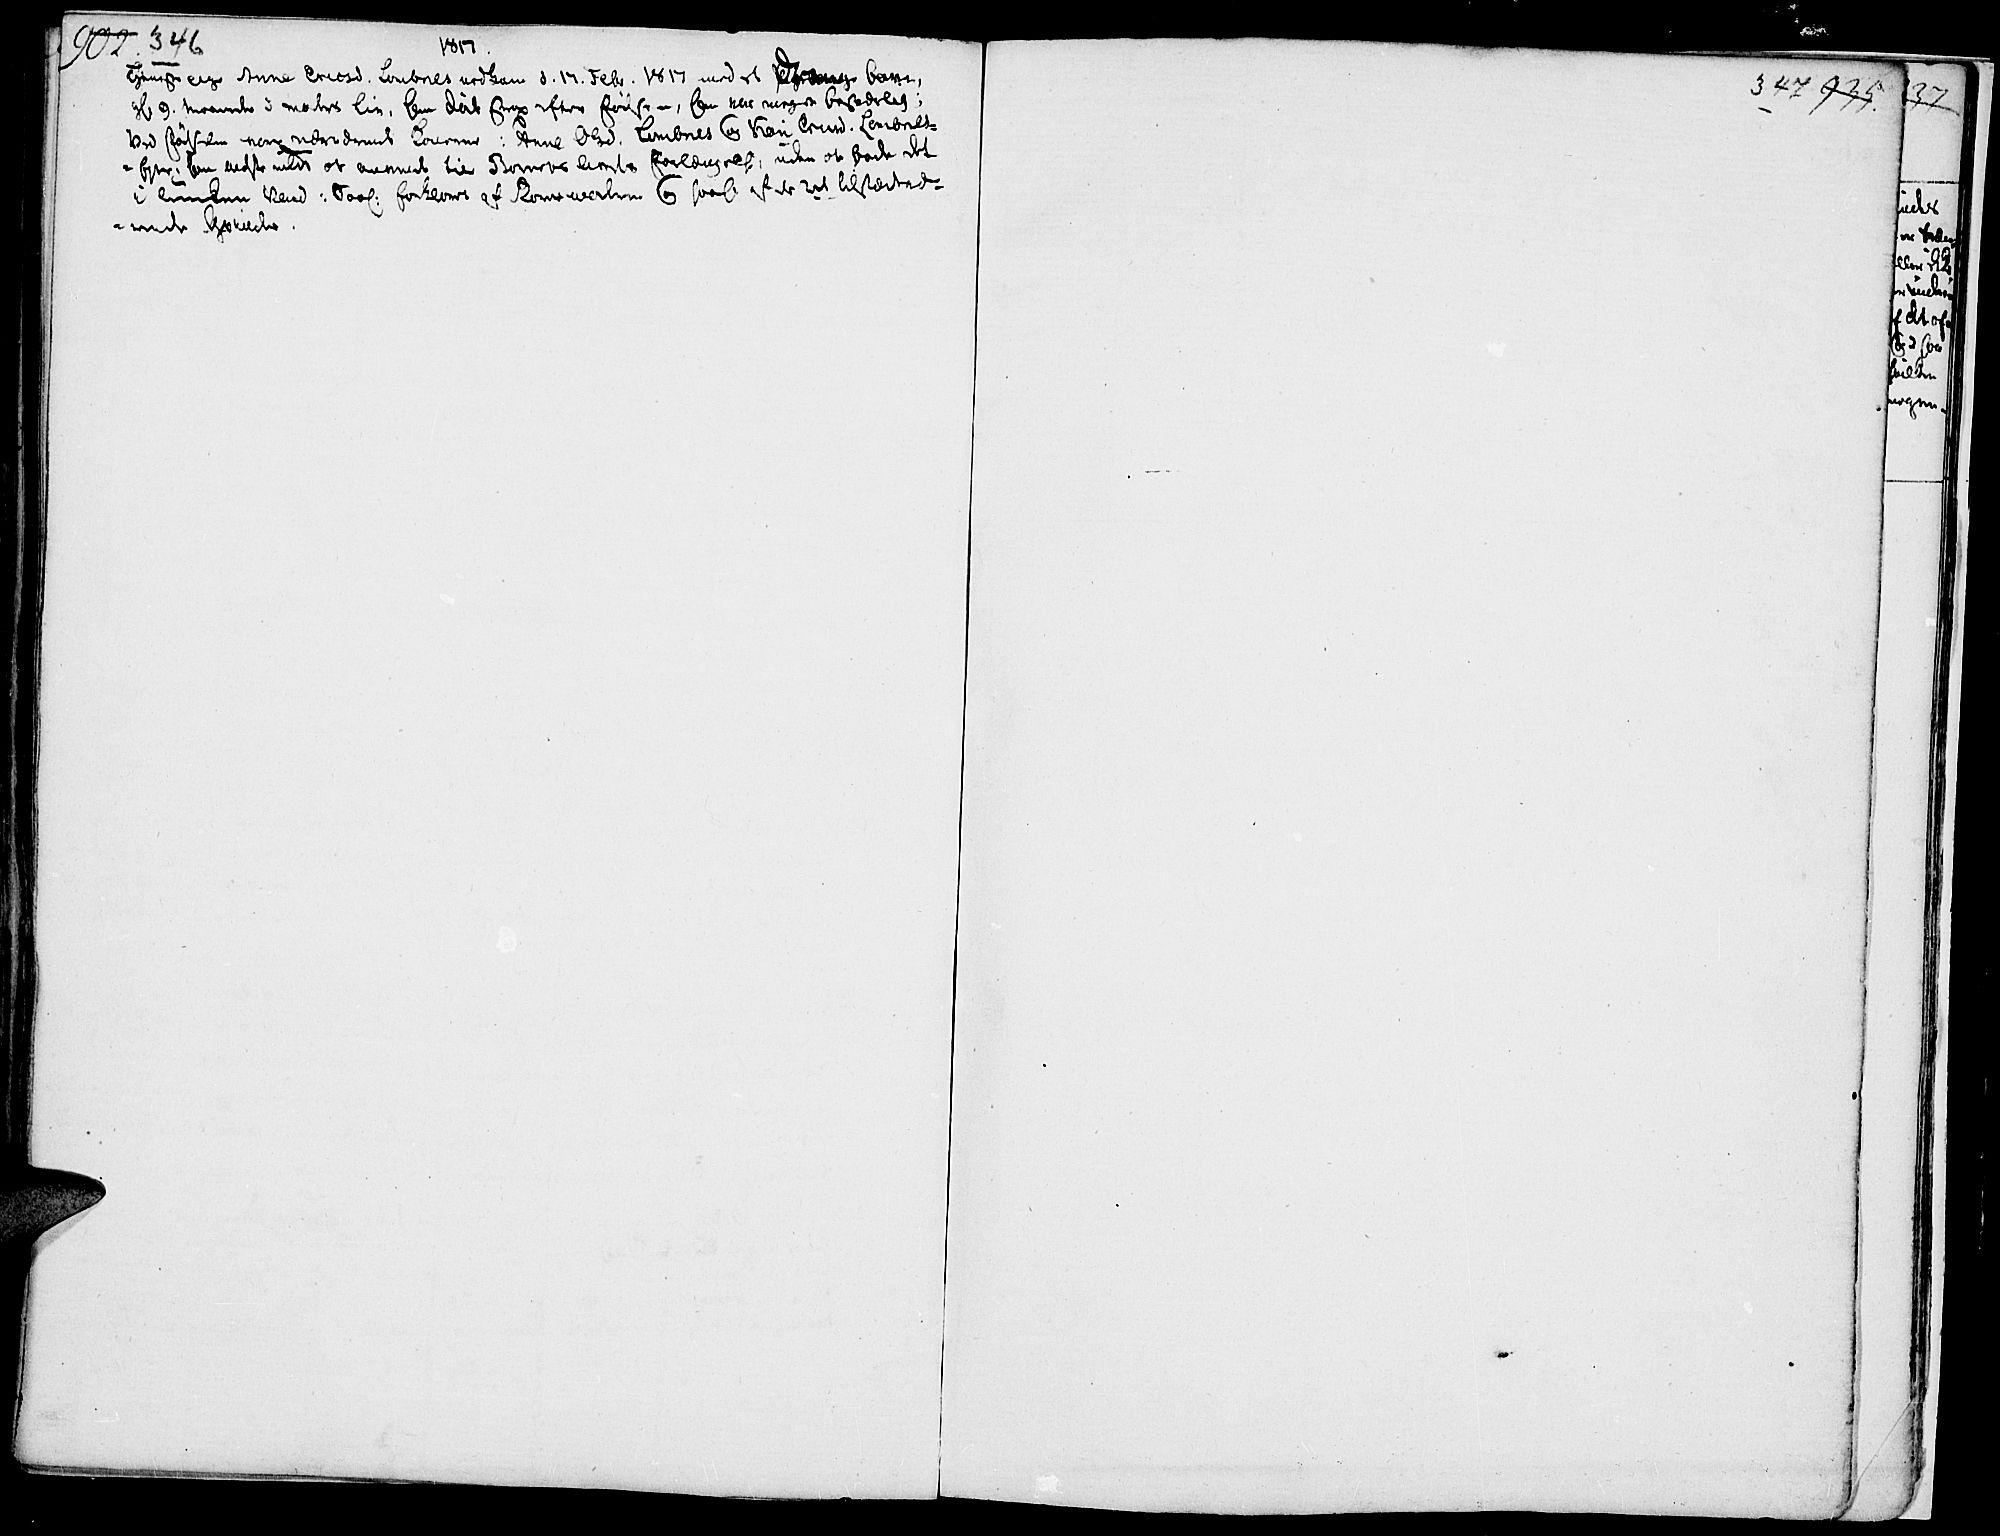 SAH, Rendalen prestekontor, H/Ha/Haa/L0002: Ministerialbok nr. 2, 1788-1814, s. 346-347